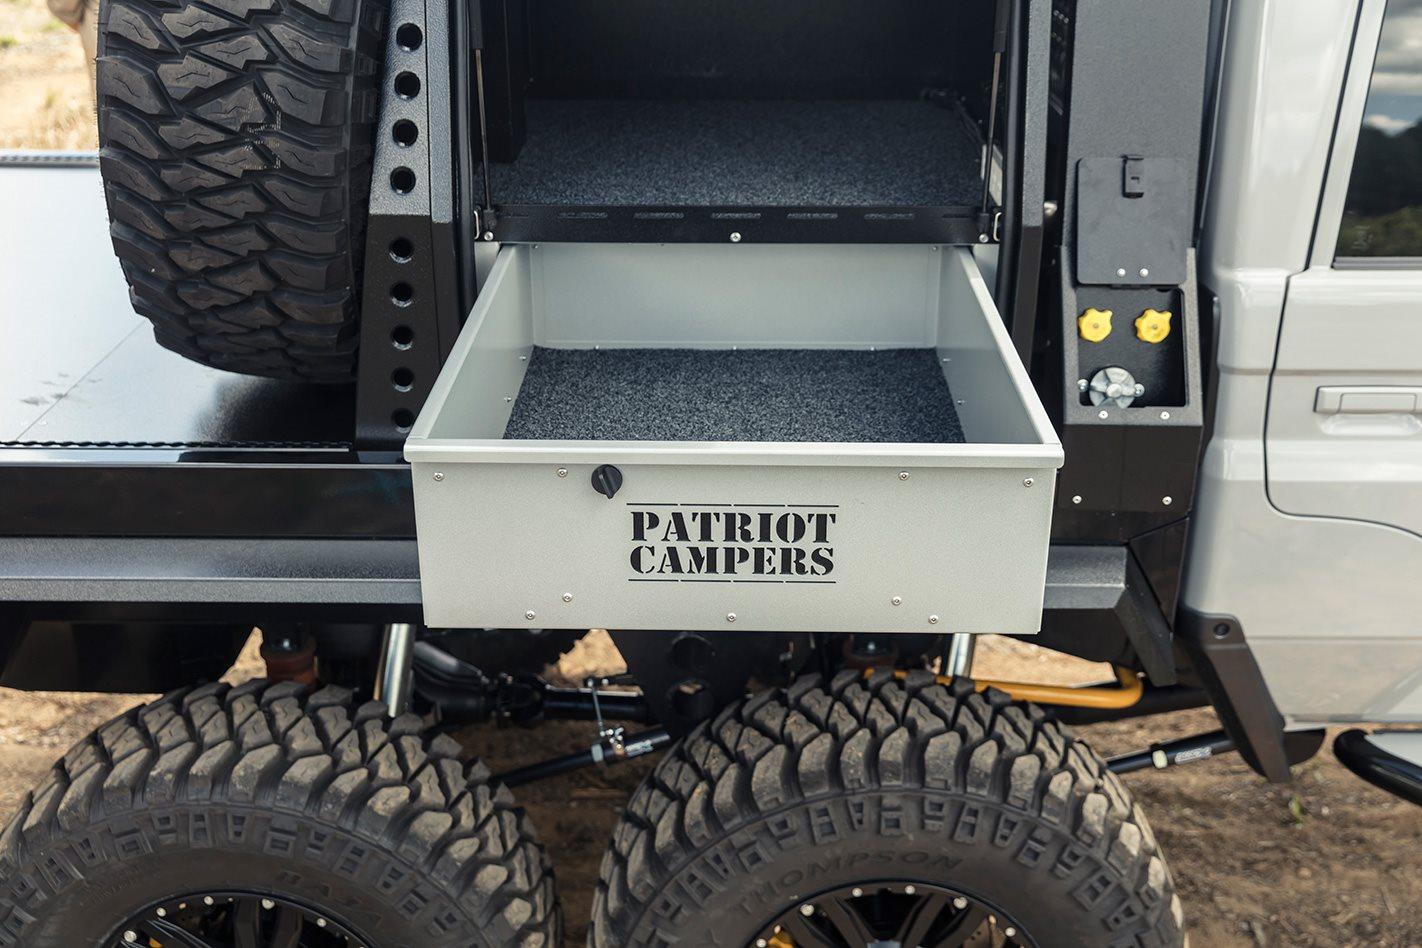 Patriot-Campers-6x6-Toyota-LC79 storage